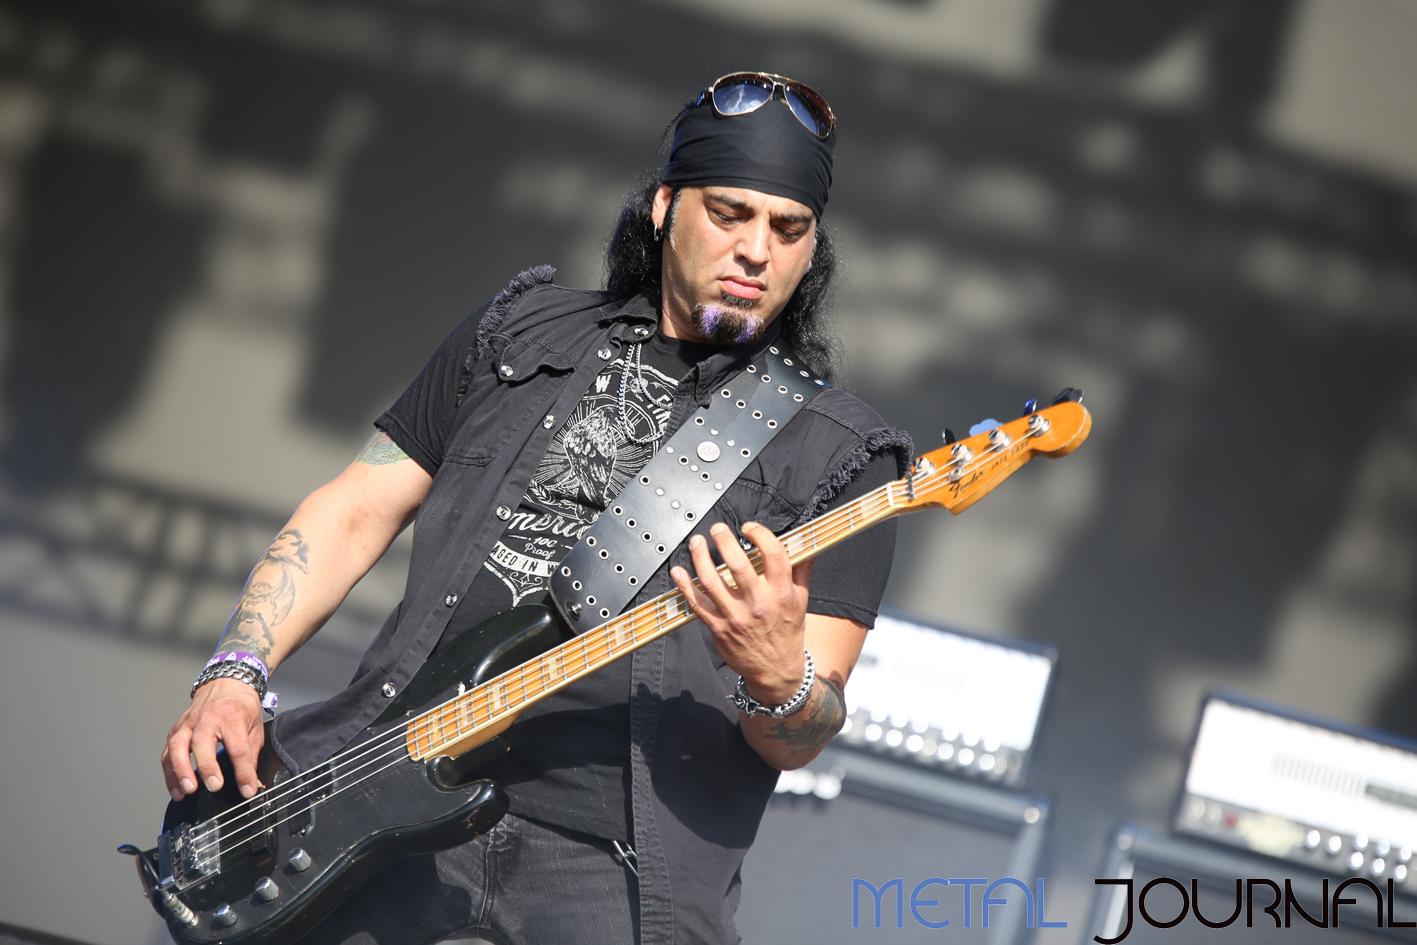 dee snider rock fest 18 - metal journal pic 6